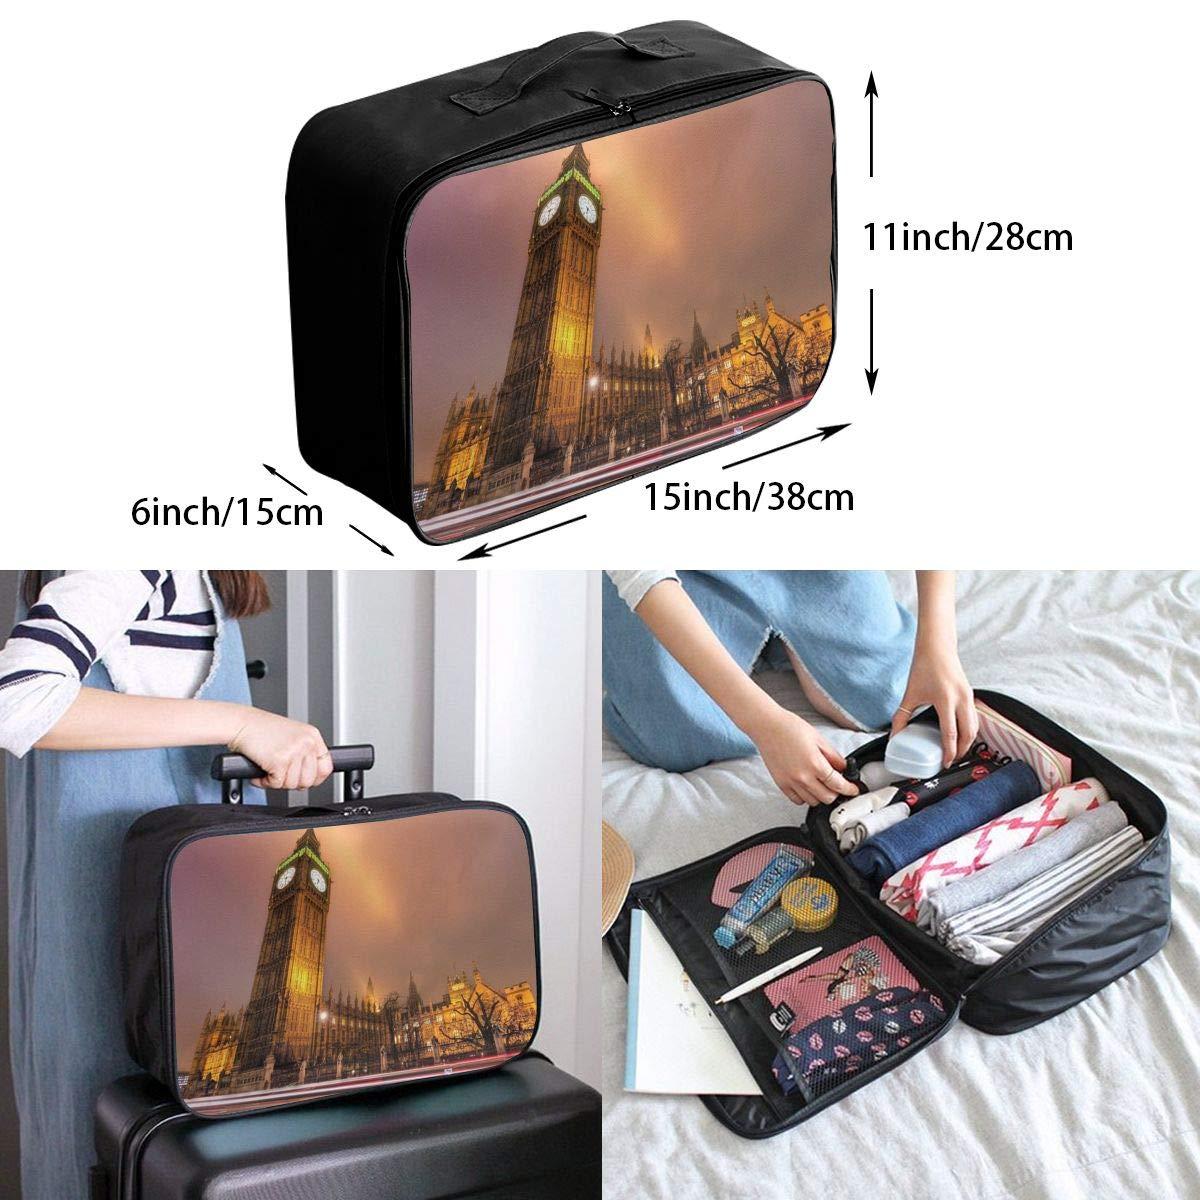 Travel Luggage Duffle Bag Lightweight Portable Handbag Big Ben Pattern Large Capacity Waterproof Foldable Storage Tote